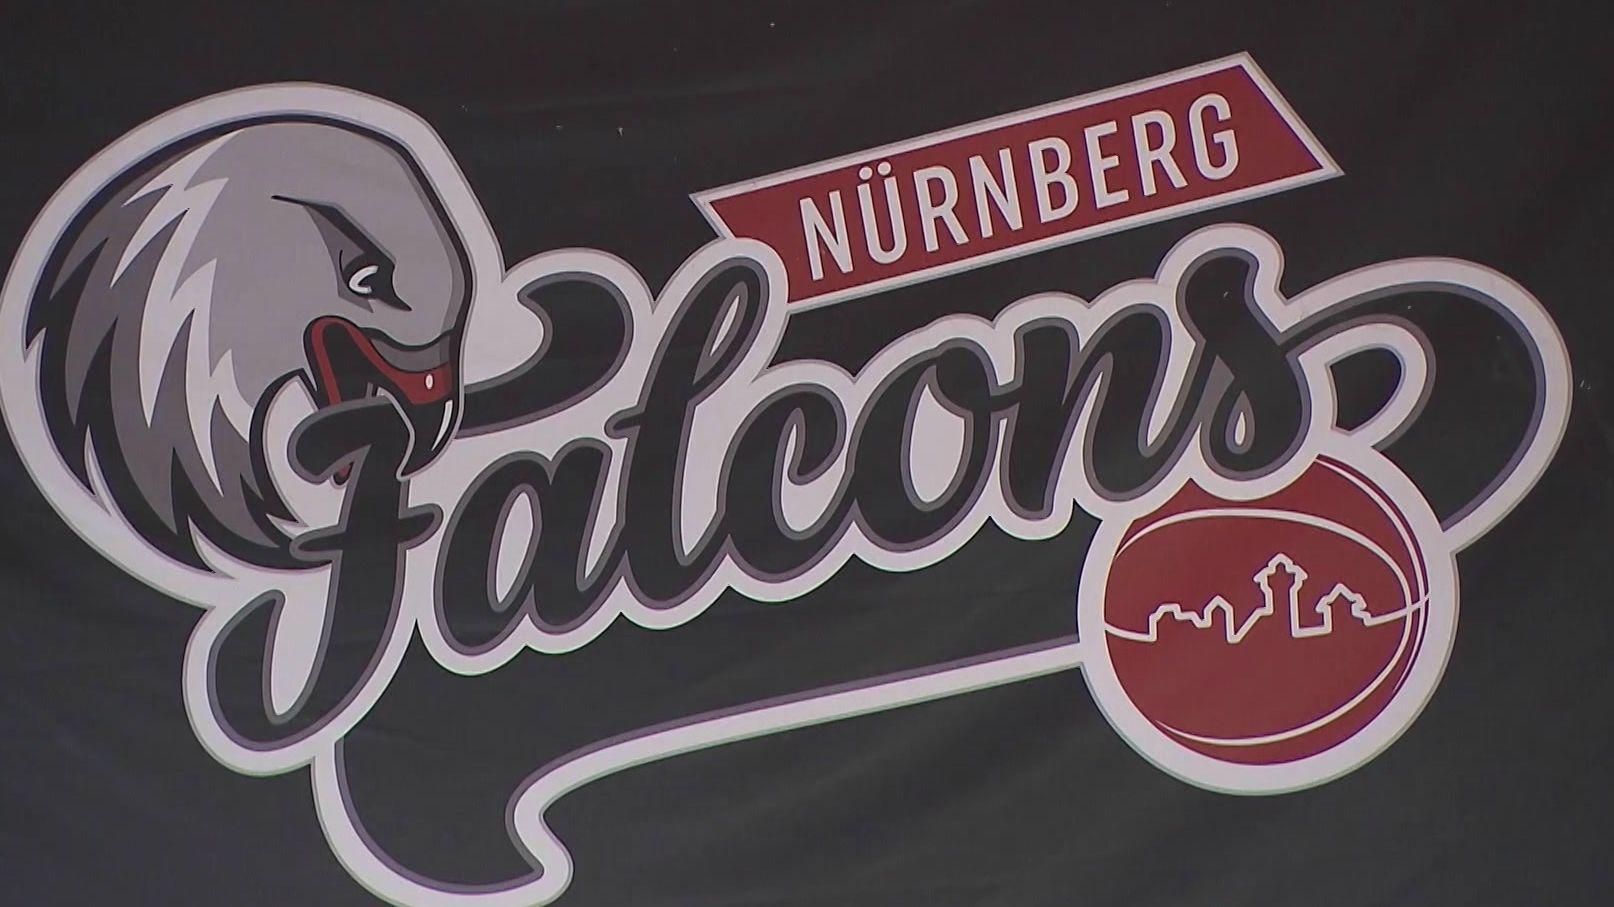 Logo der Nürnberg Falcons